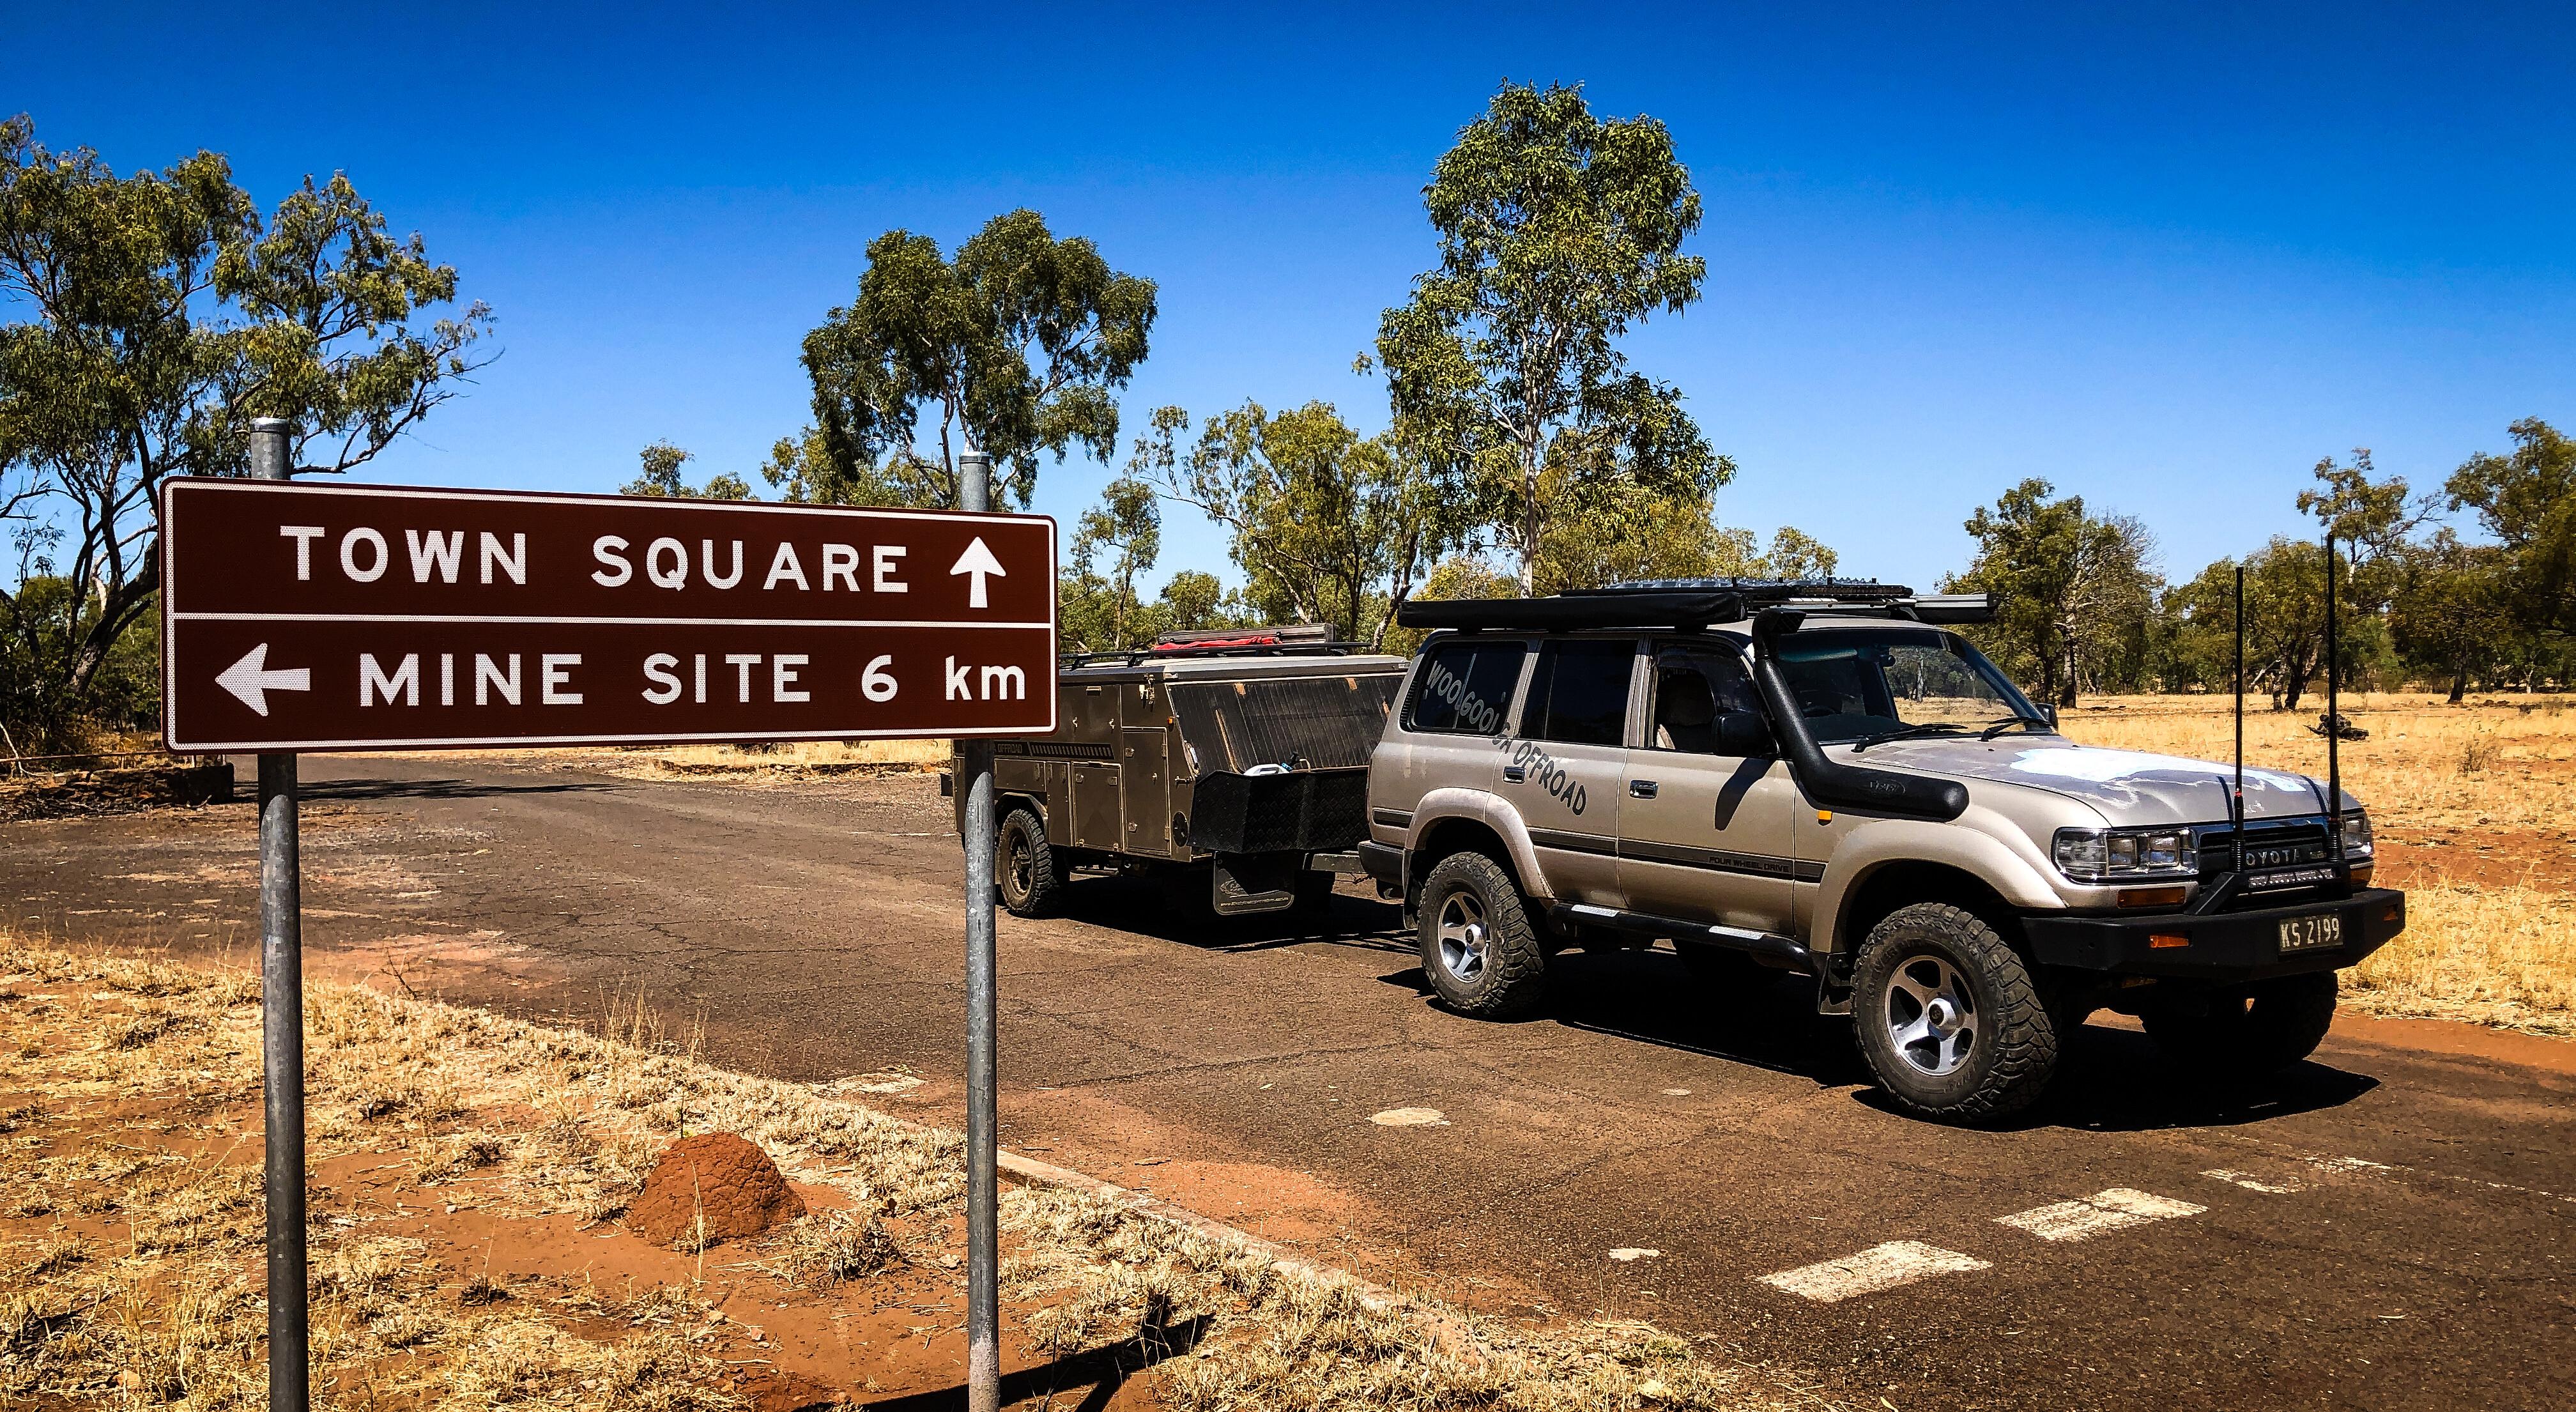 4 X 4 Australia Explore Mount Isa And Beyond 23